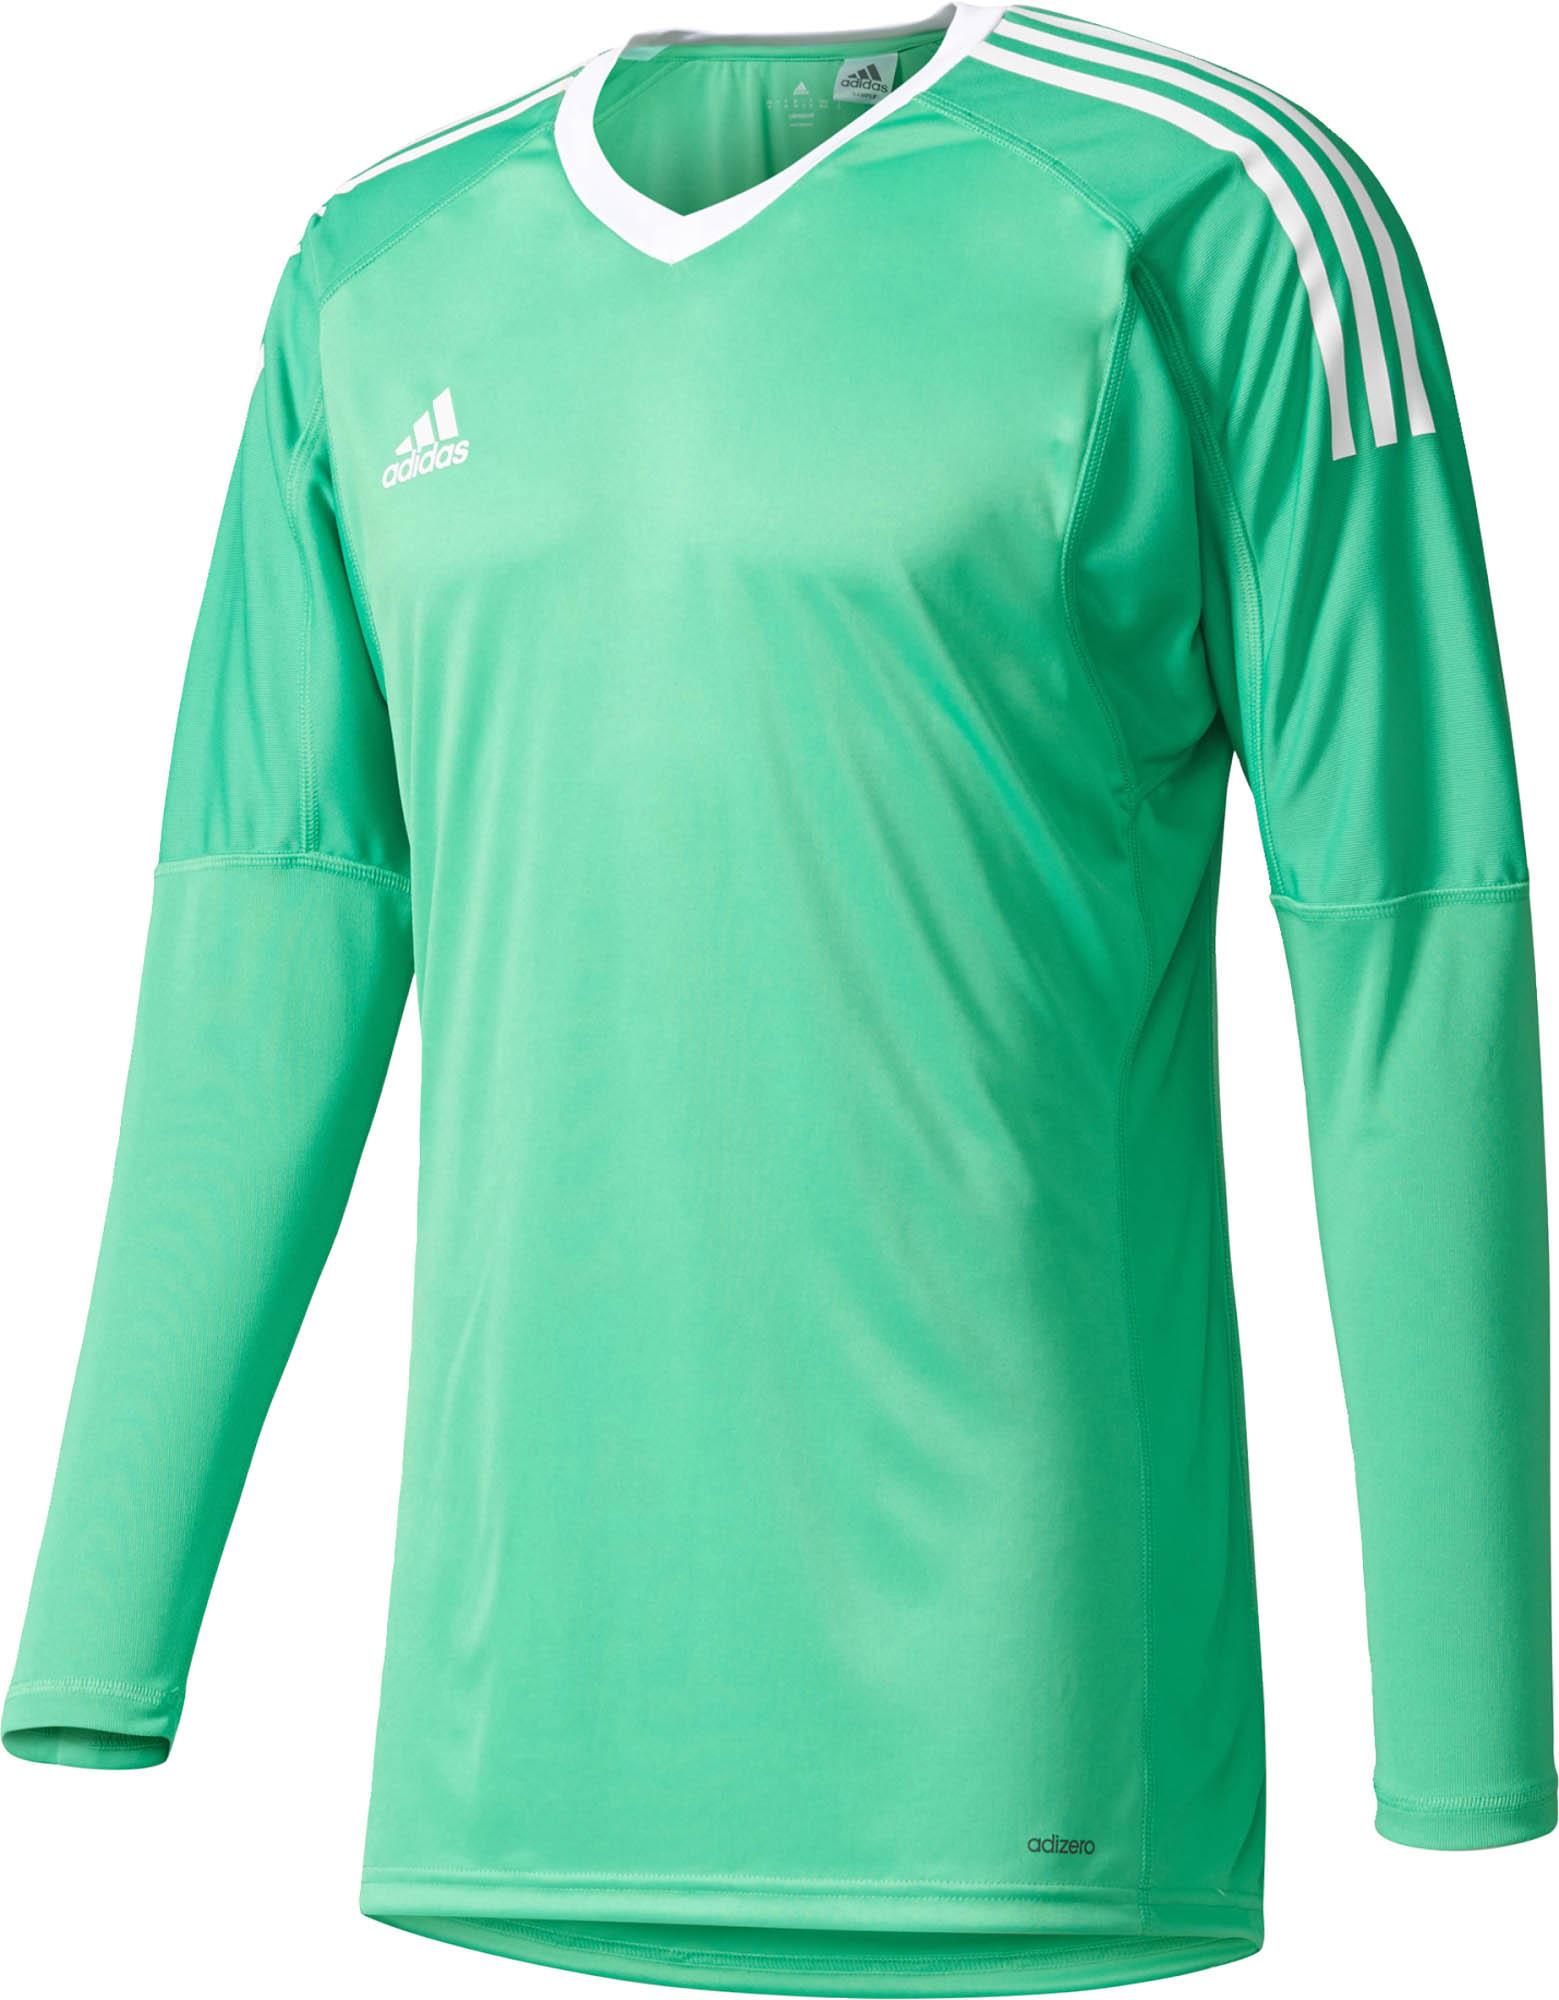 adidas Revigo 17 Goalkeeper Jersey - Energy Green & White - Soccer ...